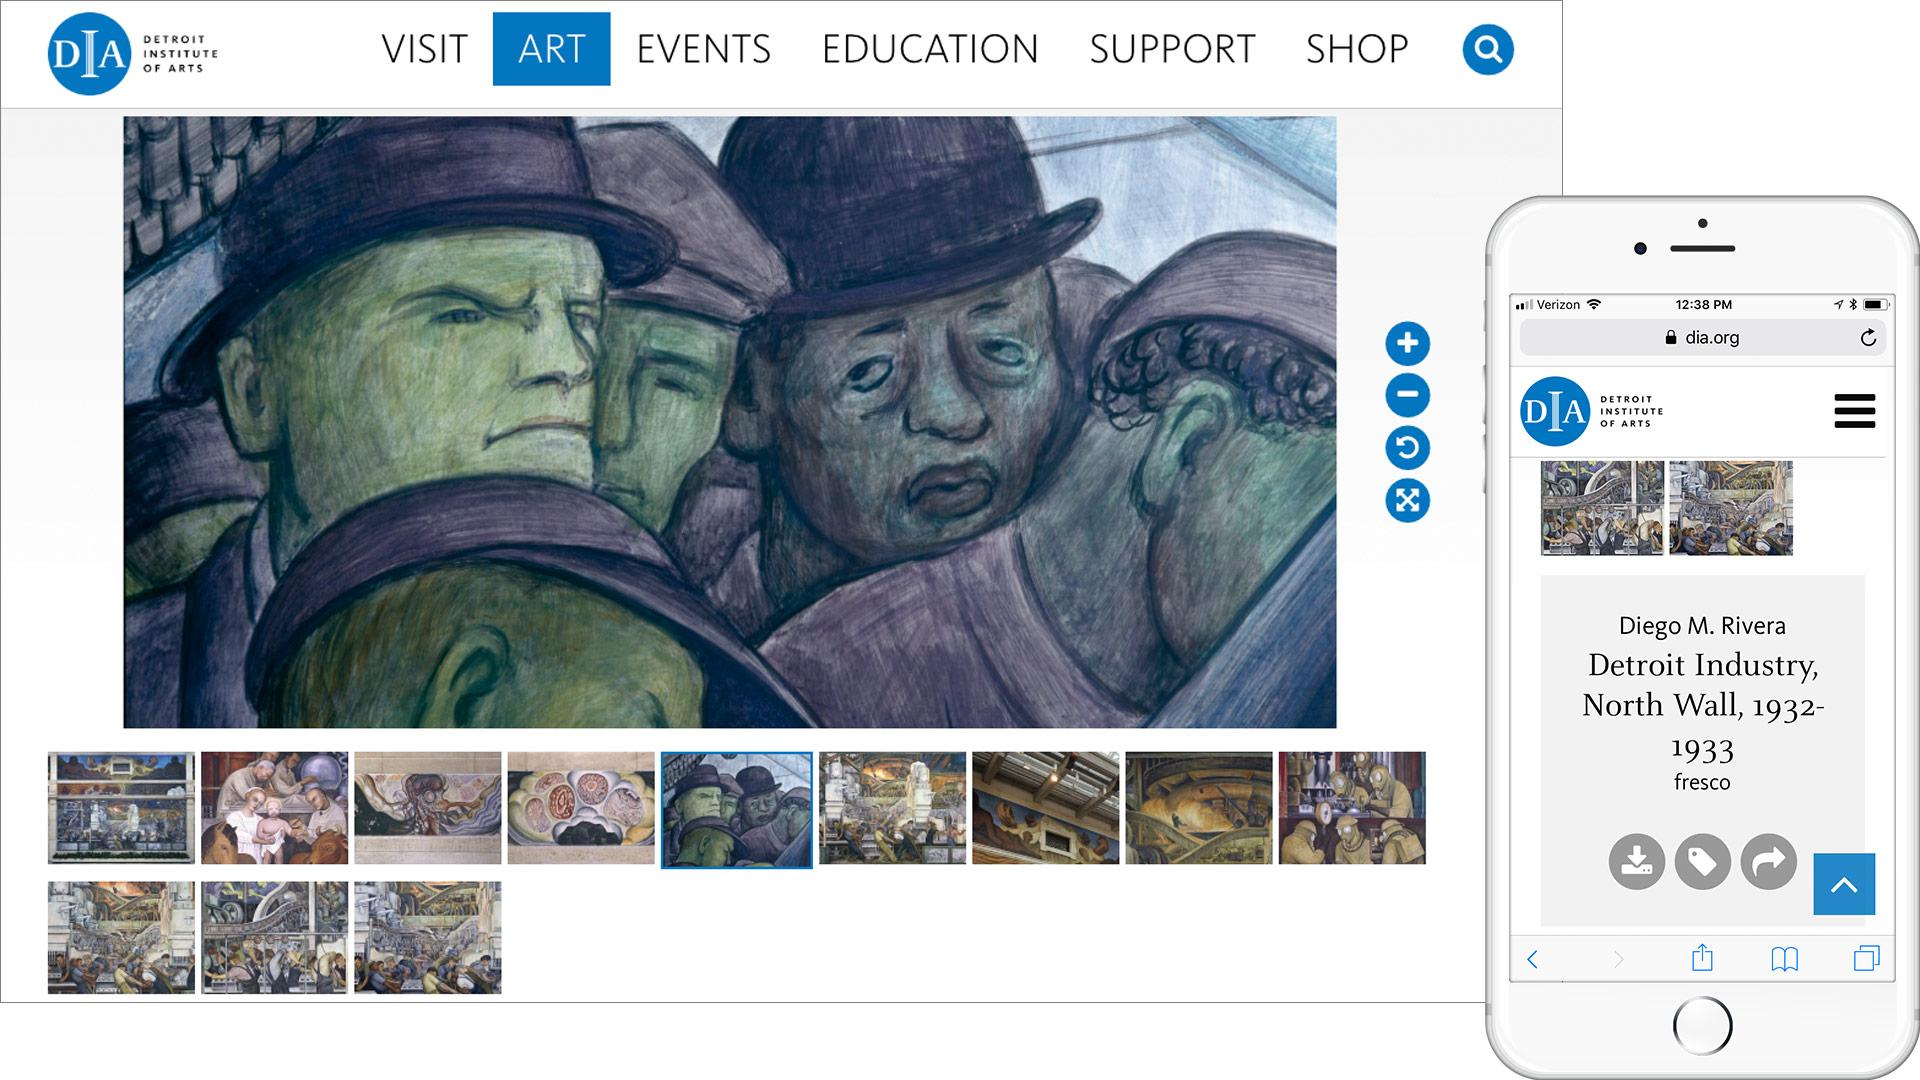 Detroit Institute of Arts online gallery